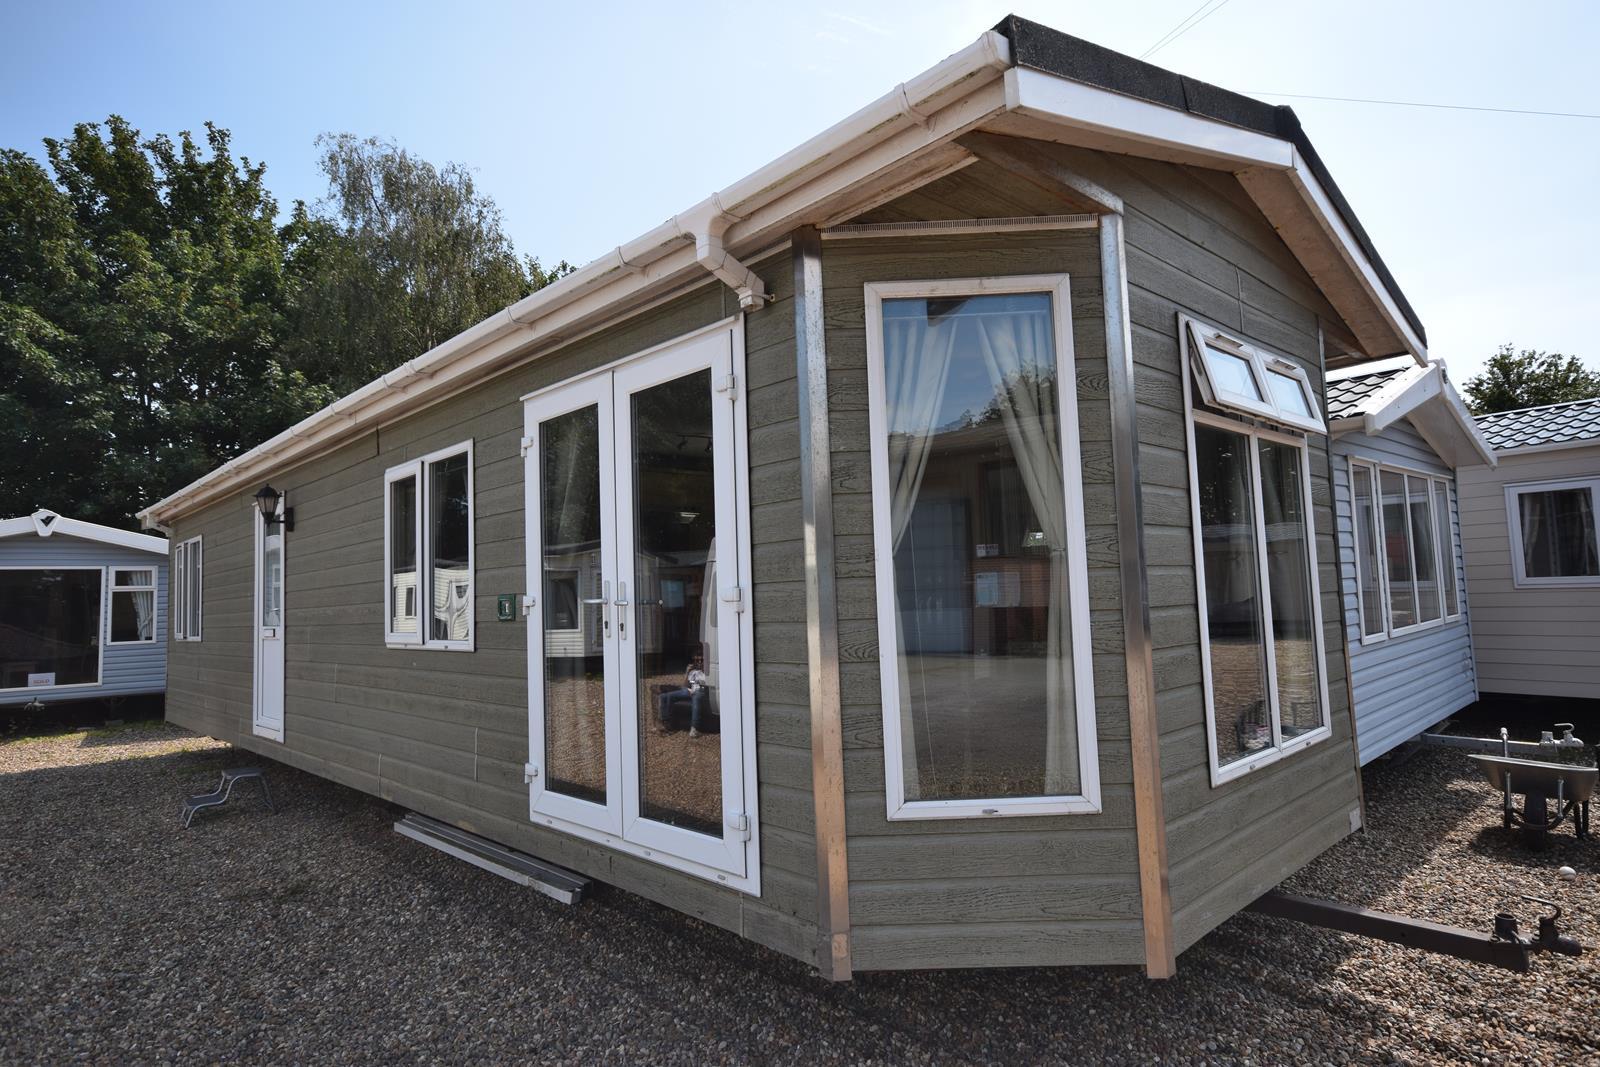 Tingdene Country Lodge Residential Mobile Home Exterior